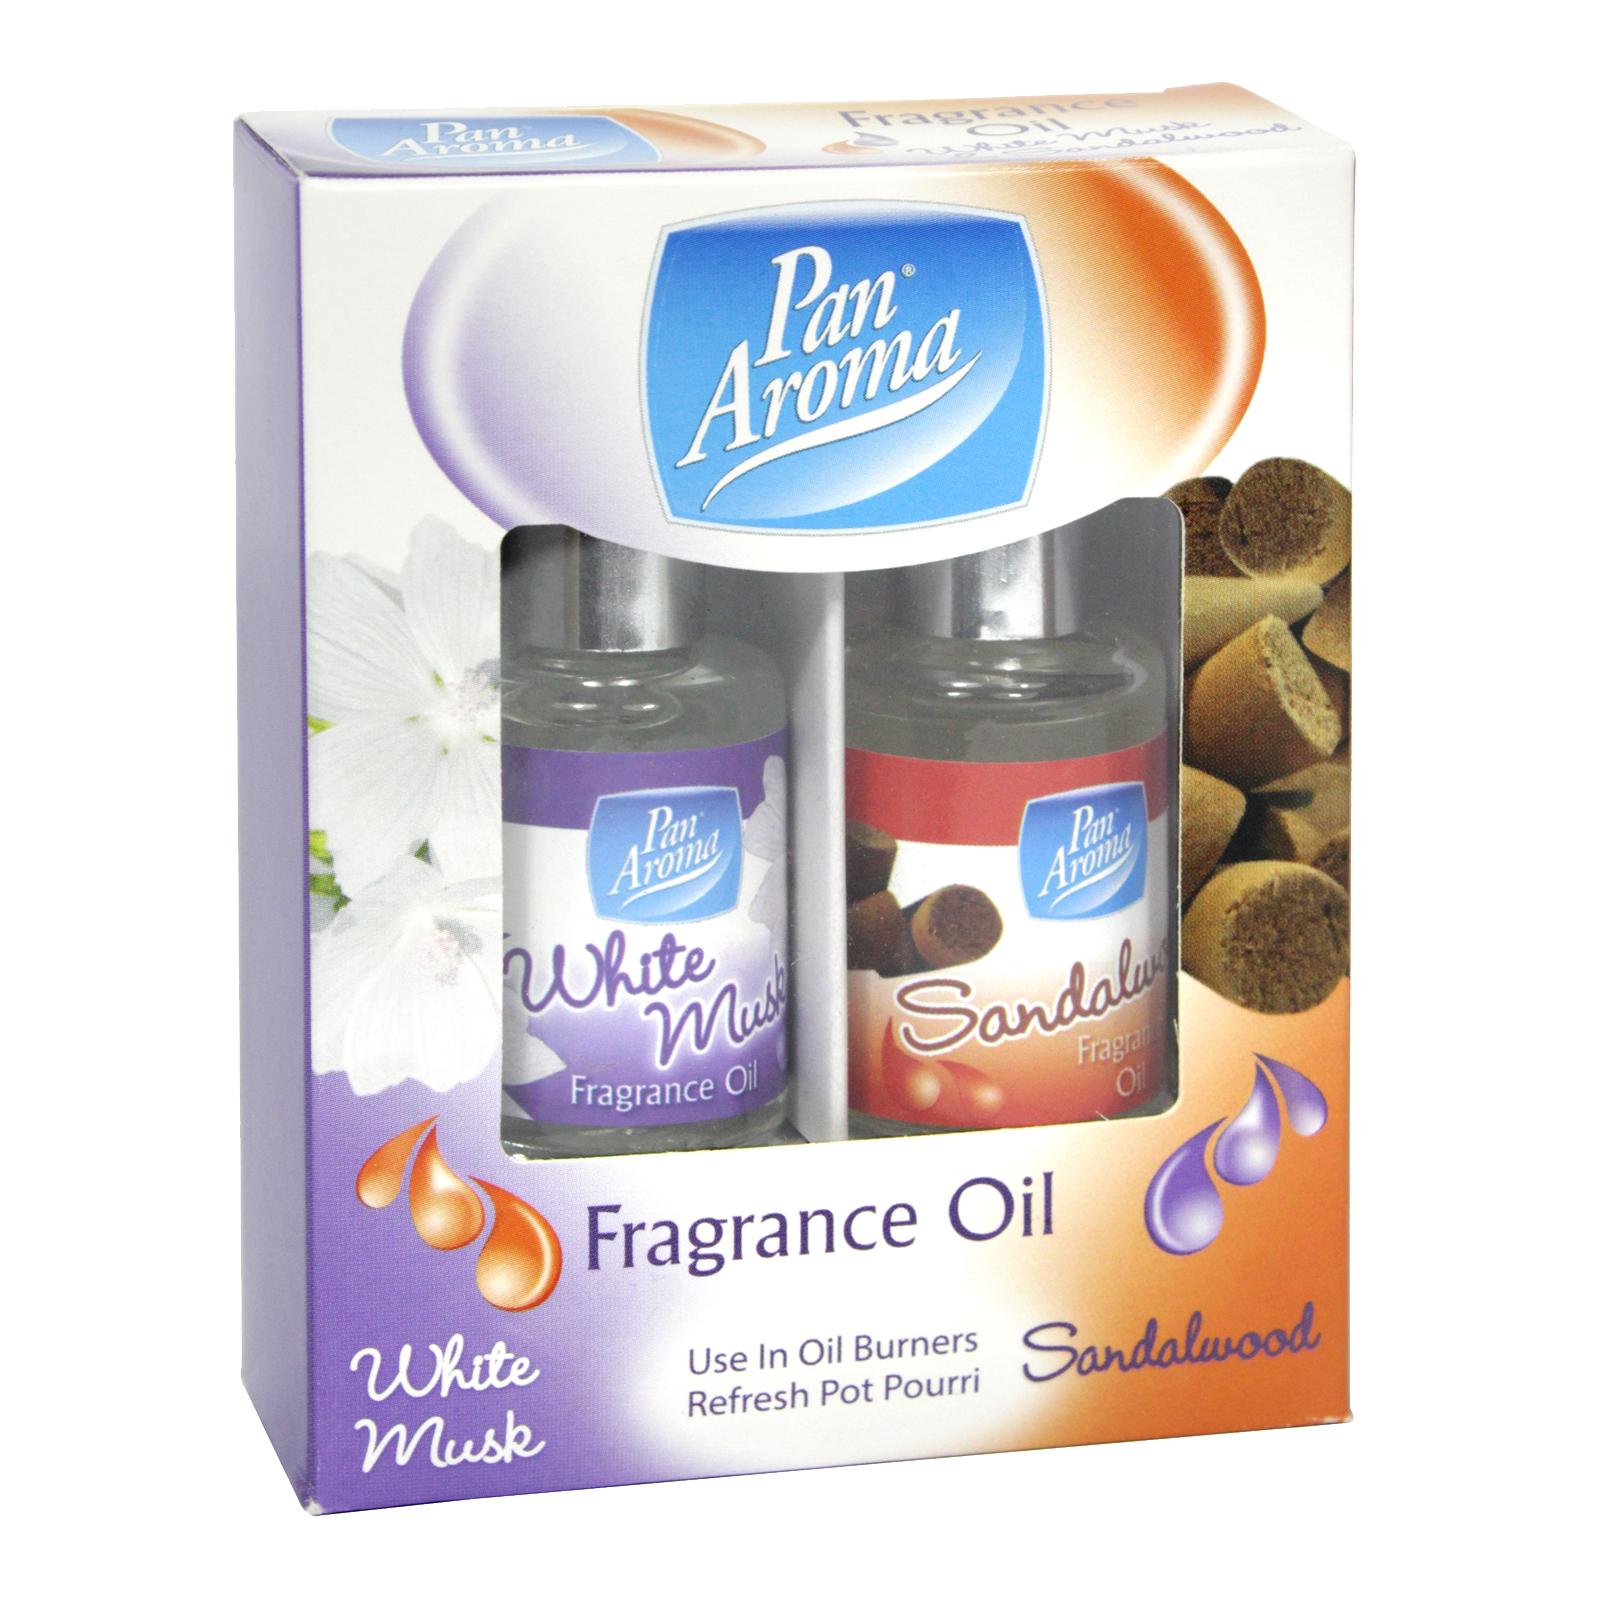 PAN AROMA 2X10ML FRAGRANCE OILS MUSK+SANDALWOOD